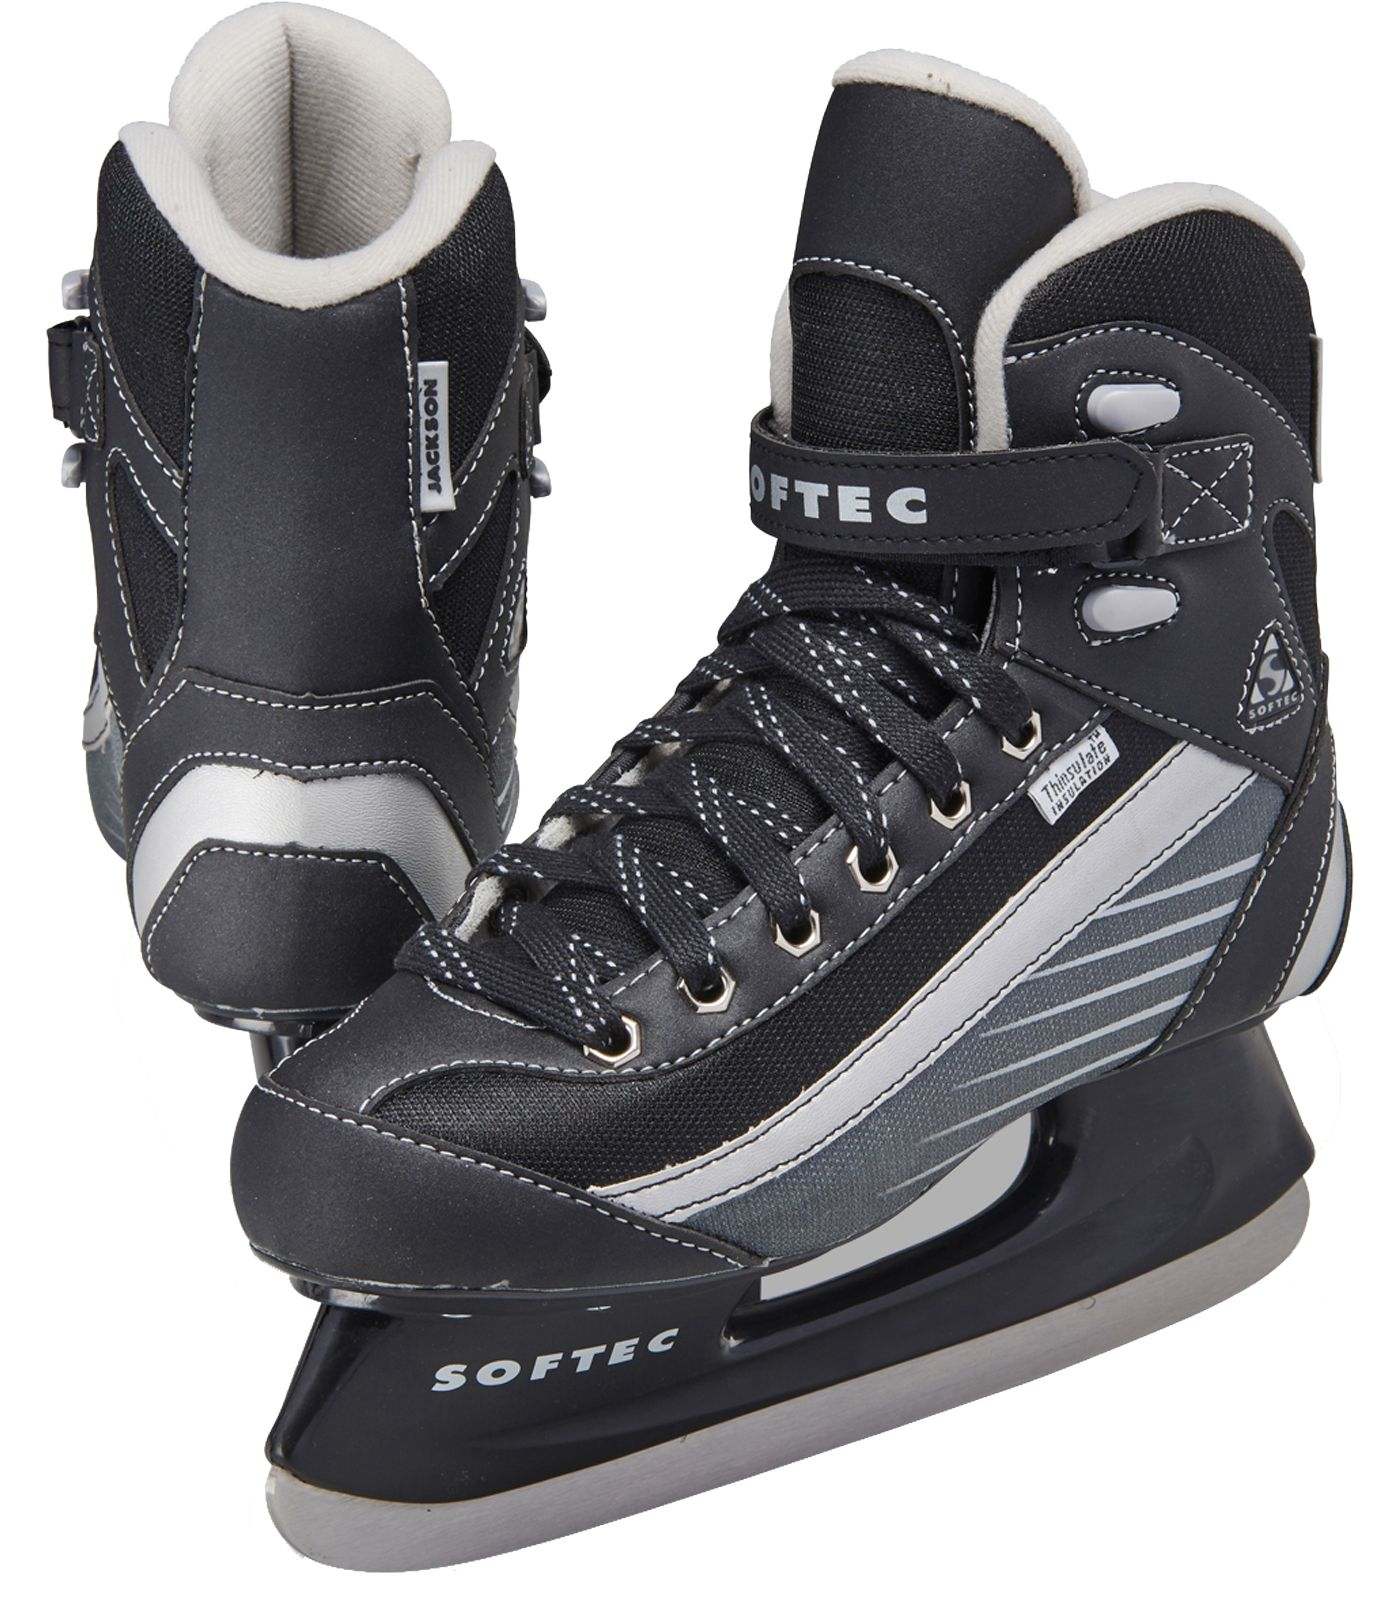 Jackson Ultima Boys' Softec Sport Ice Skates